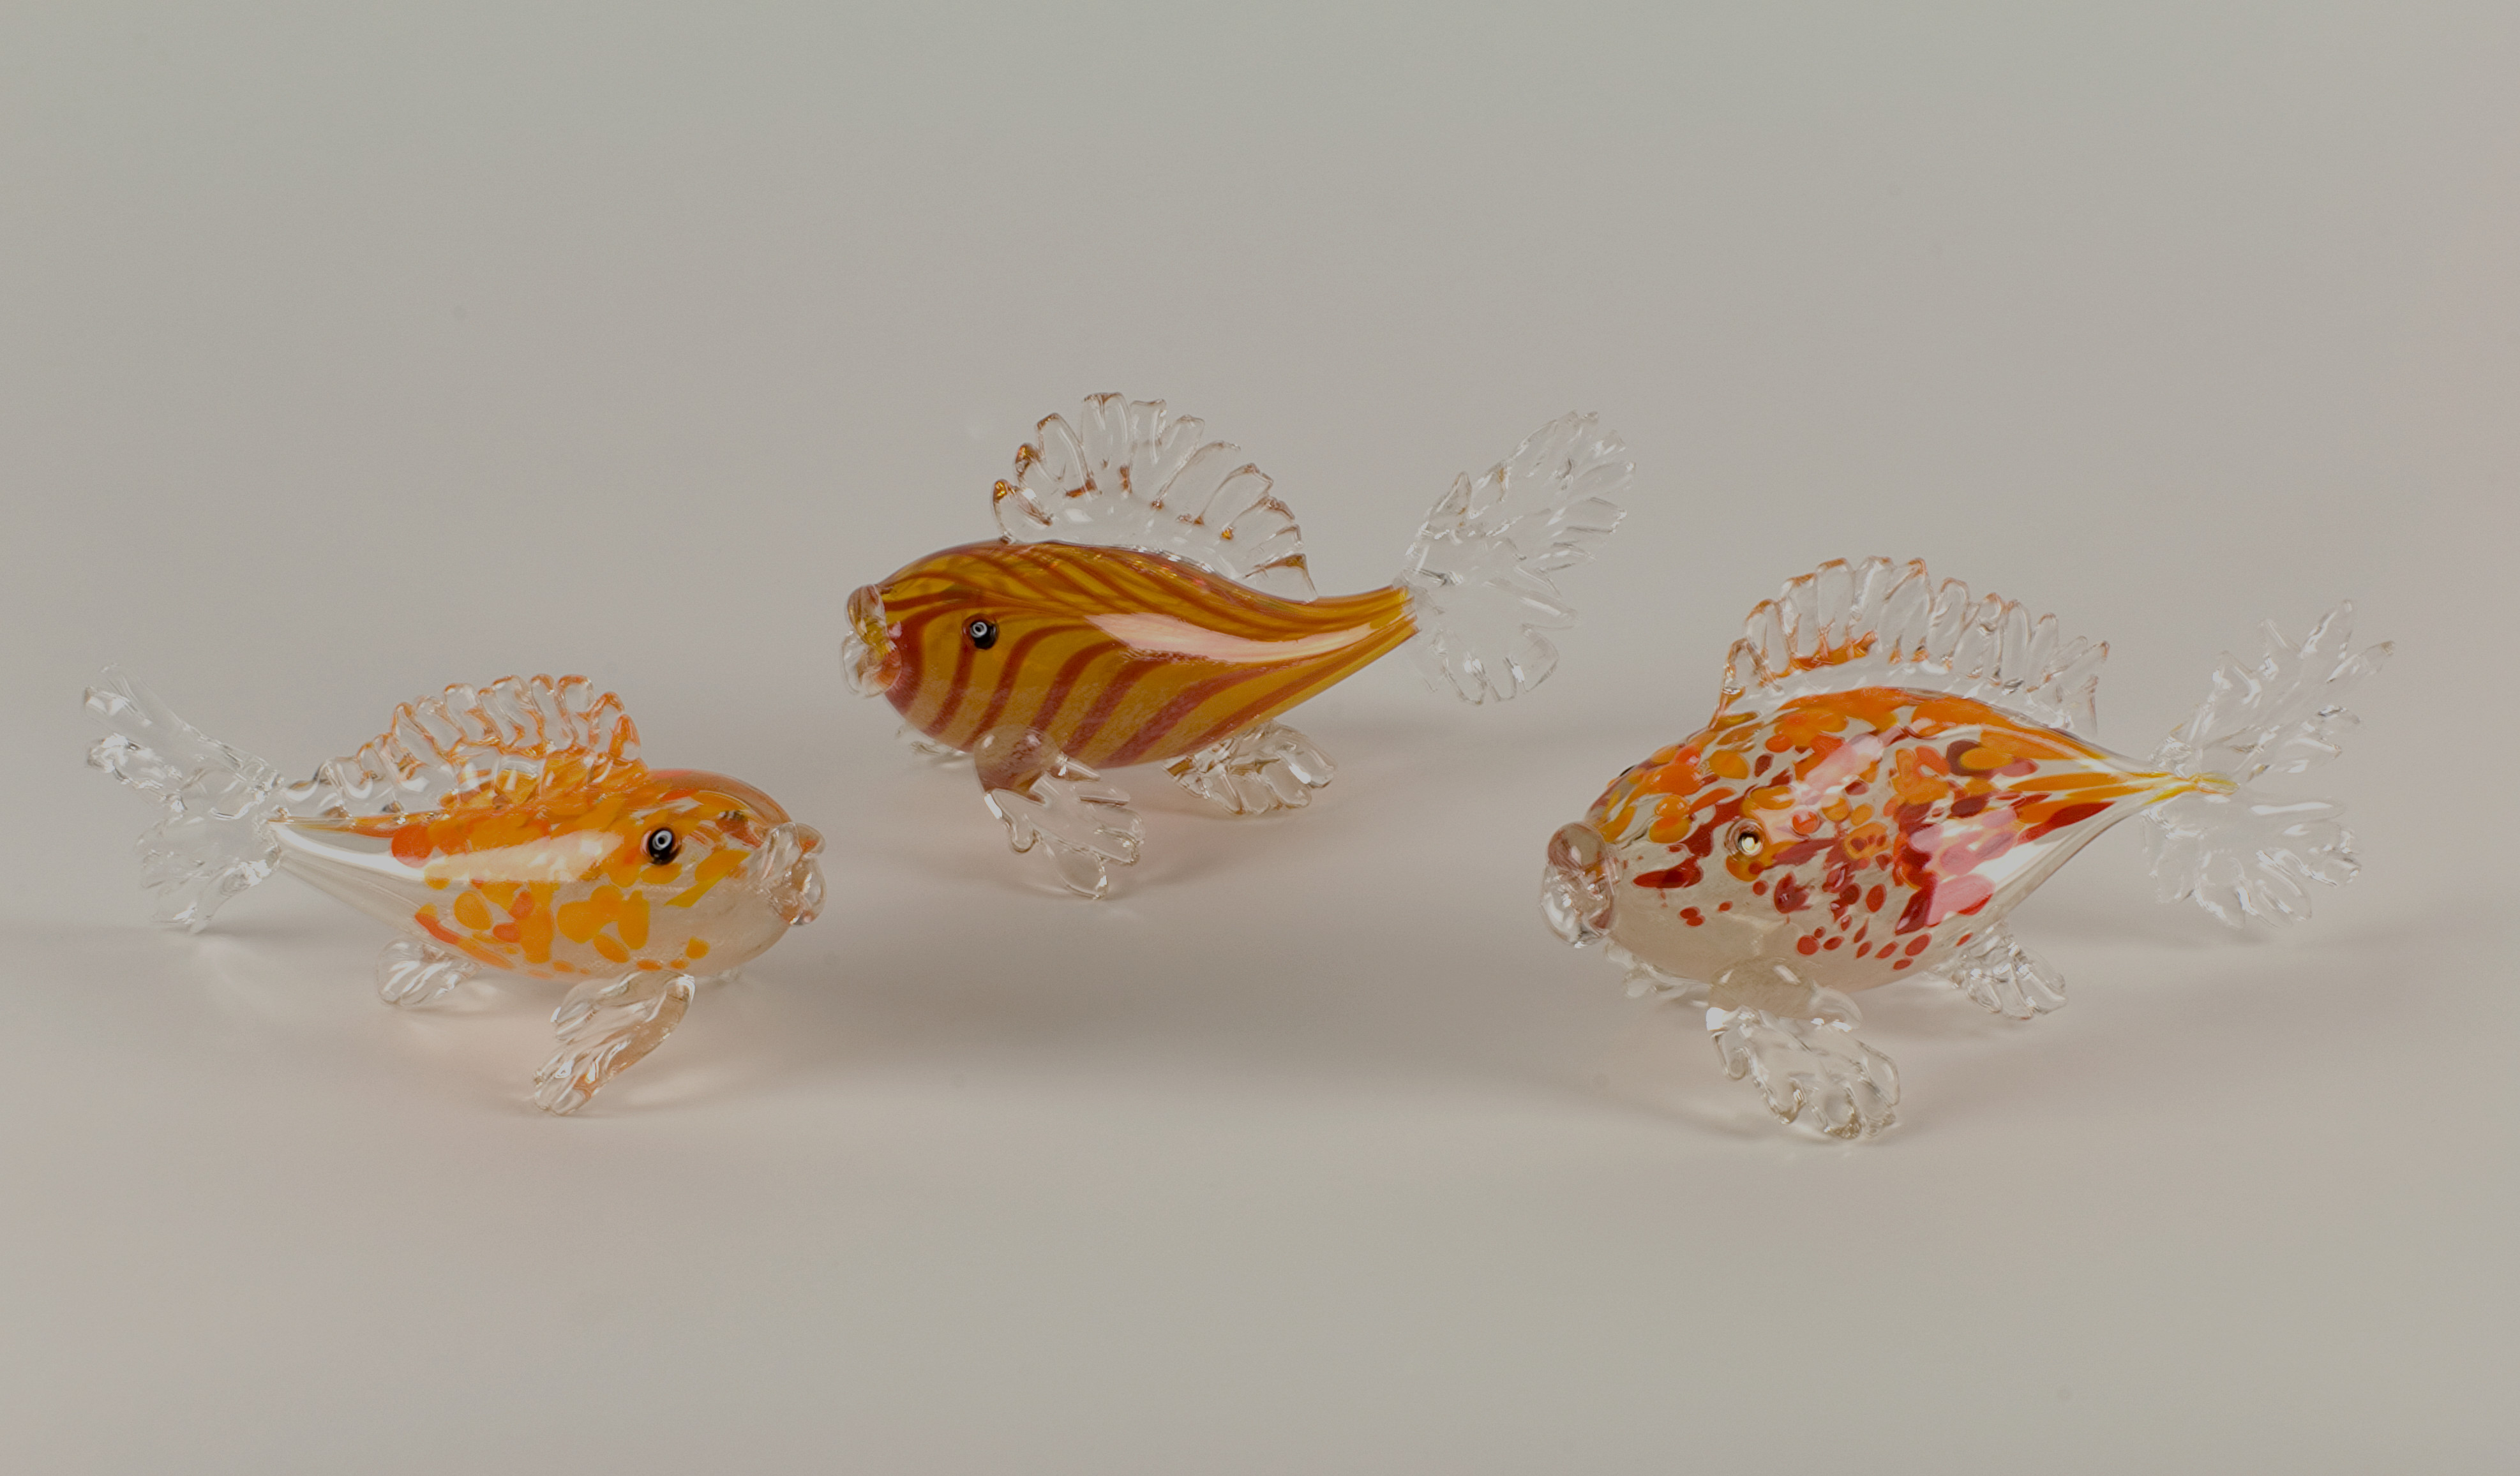 Tres Pesces